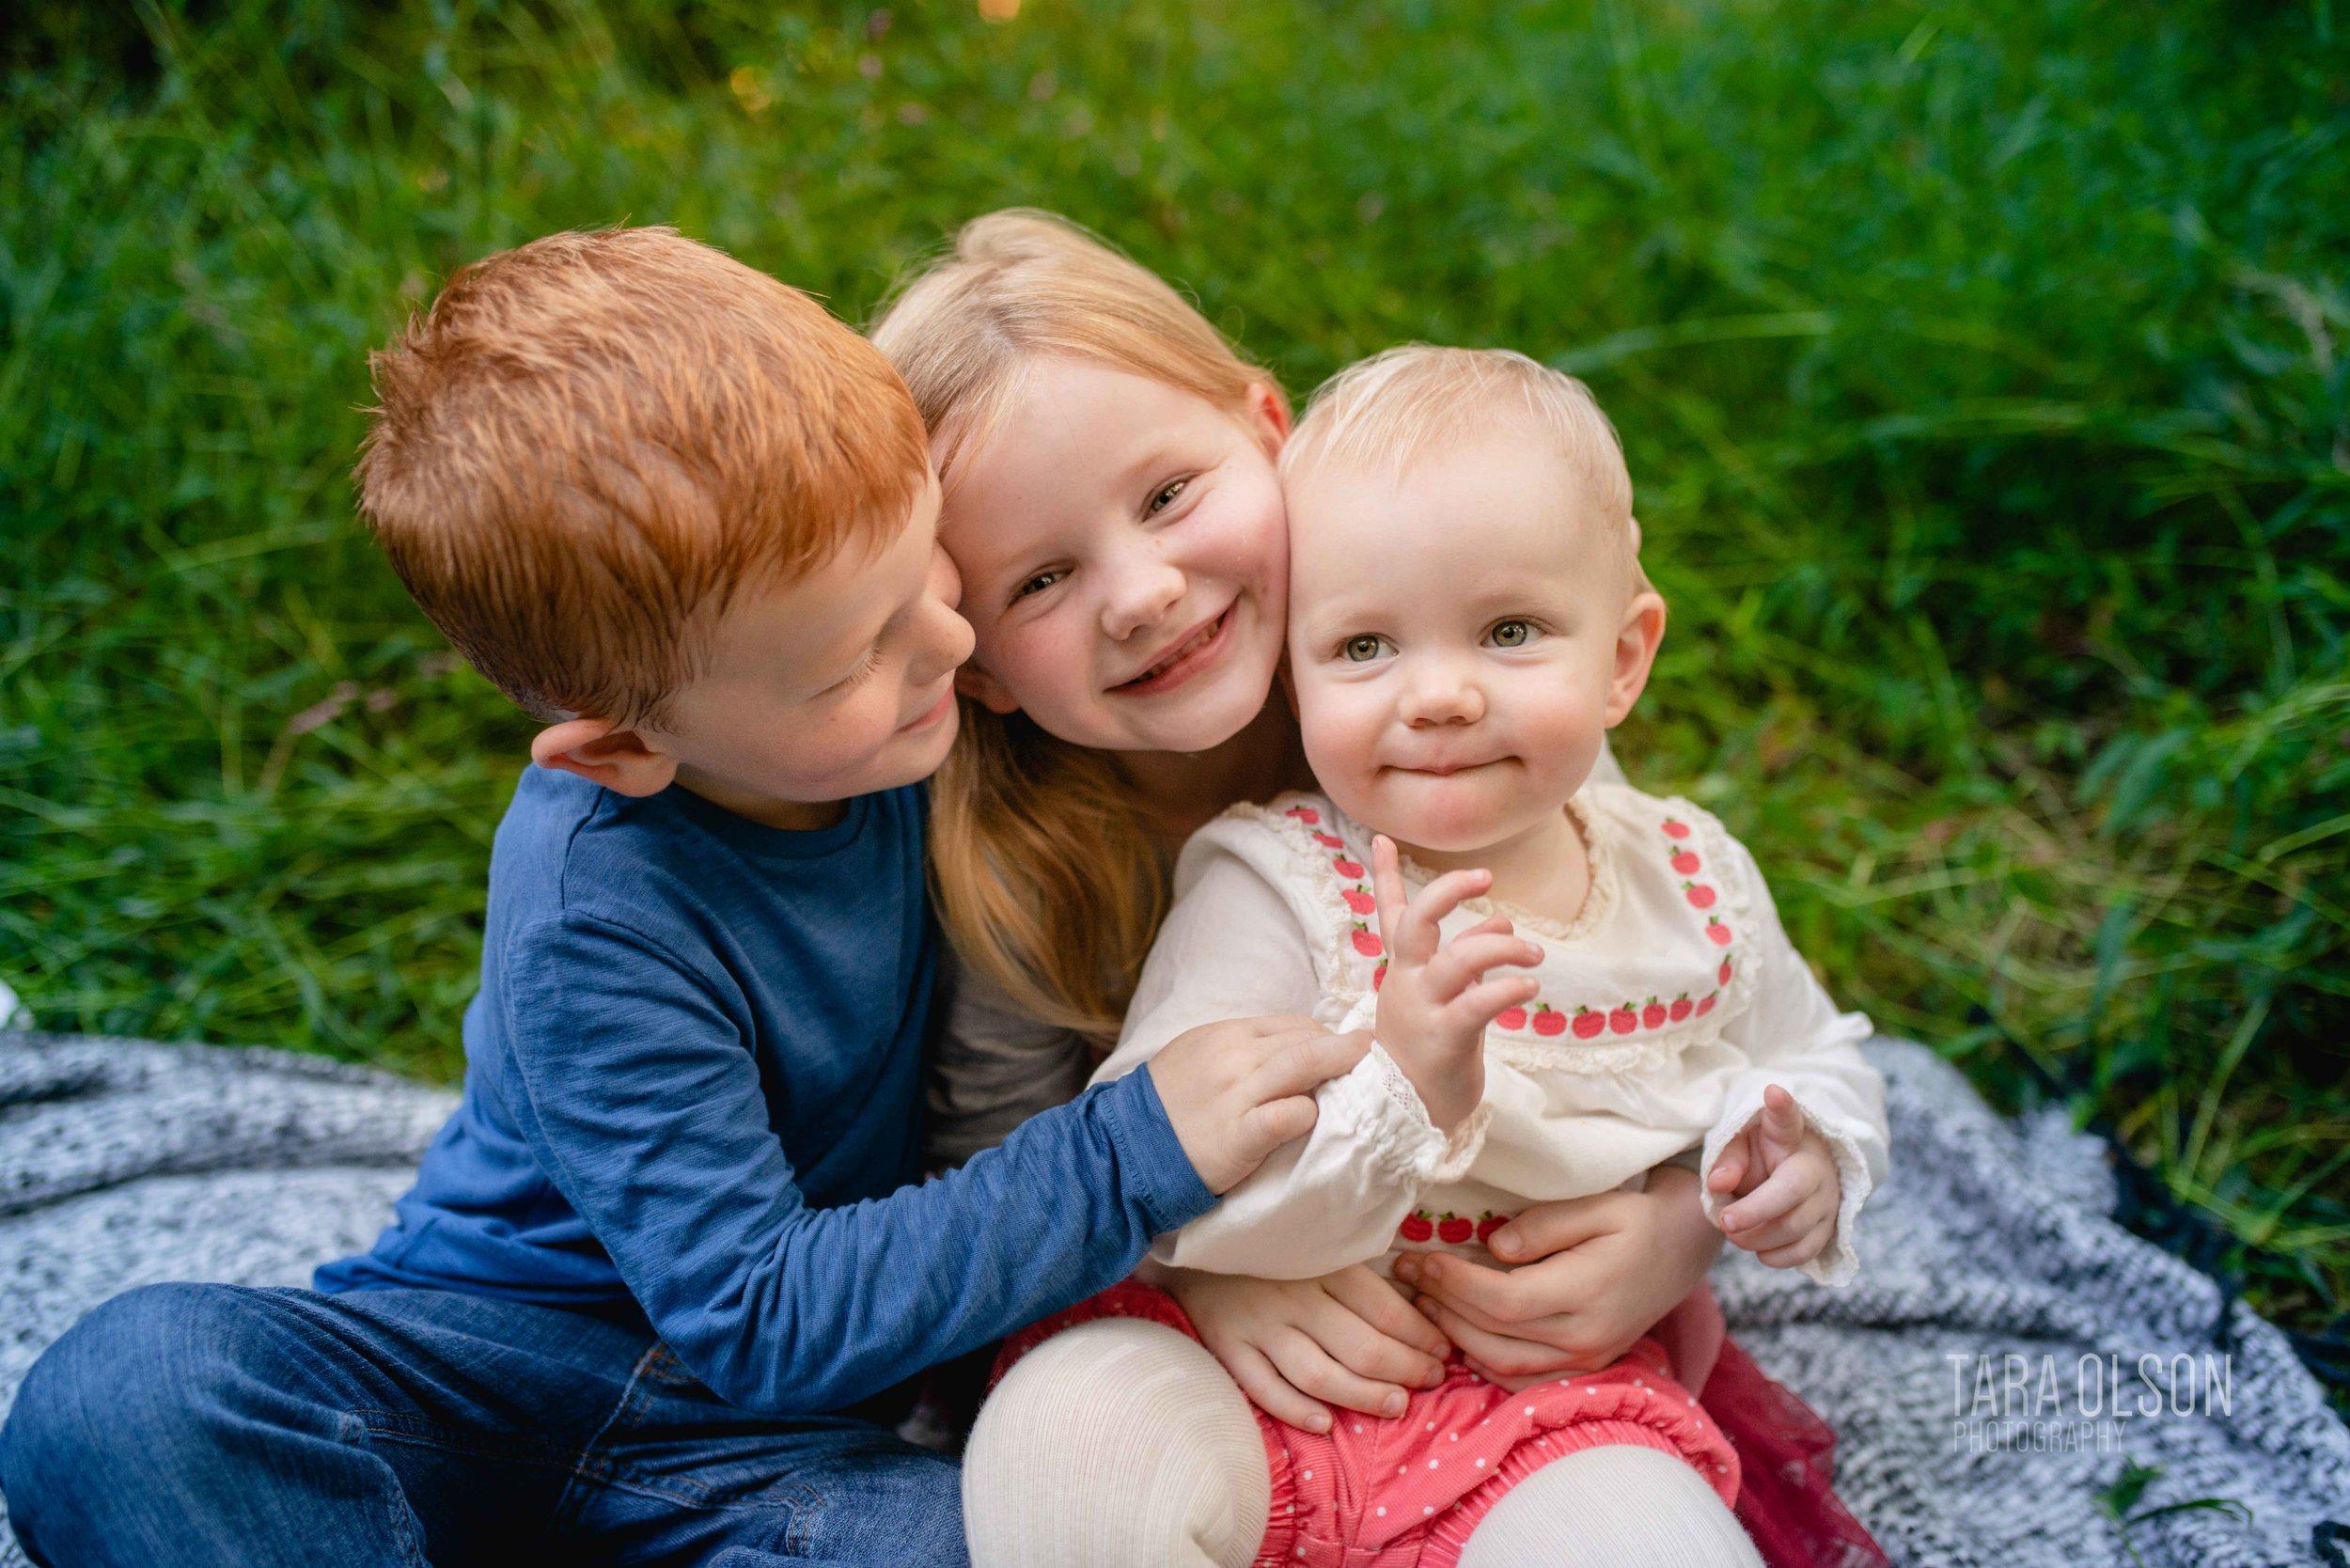 Hawkins_Arlington-Virginia-Family-Photographer_Tara-Olson-Photography_4207.jpg